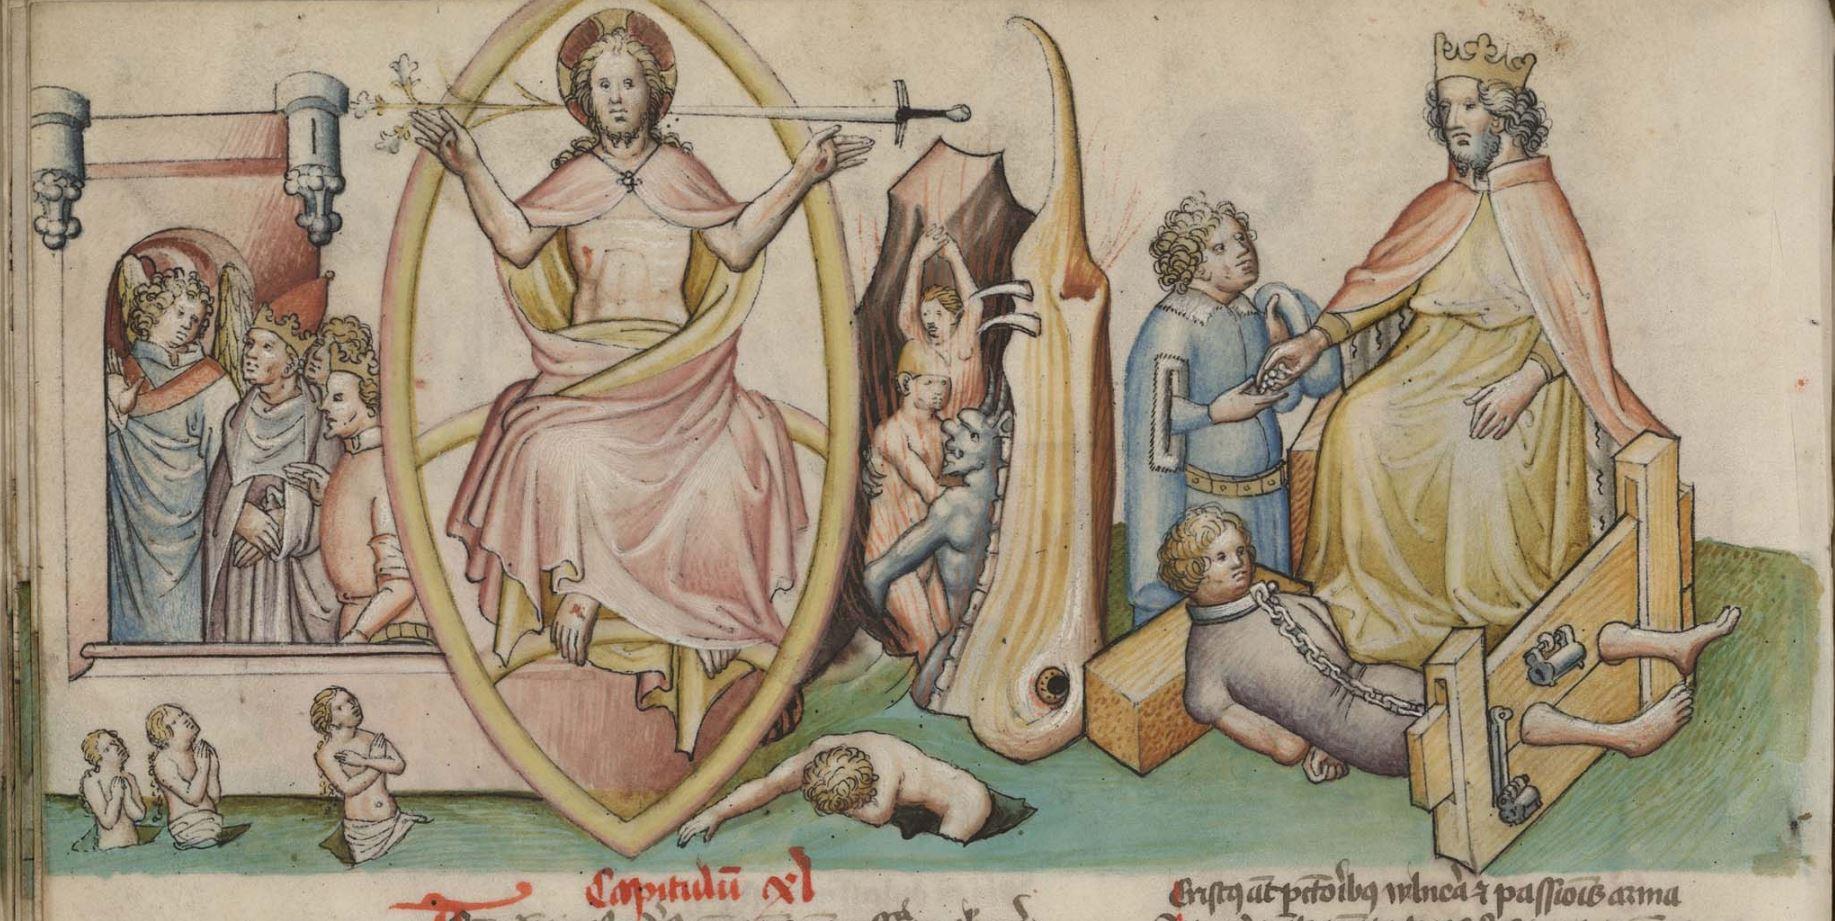 Speculum humanae salvationis 1432 Madrid, Biblioteca Nacional de Espana, Vit. 25-7 fol 36v